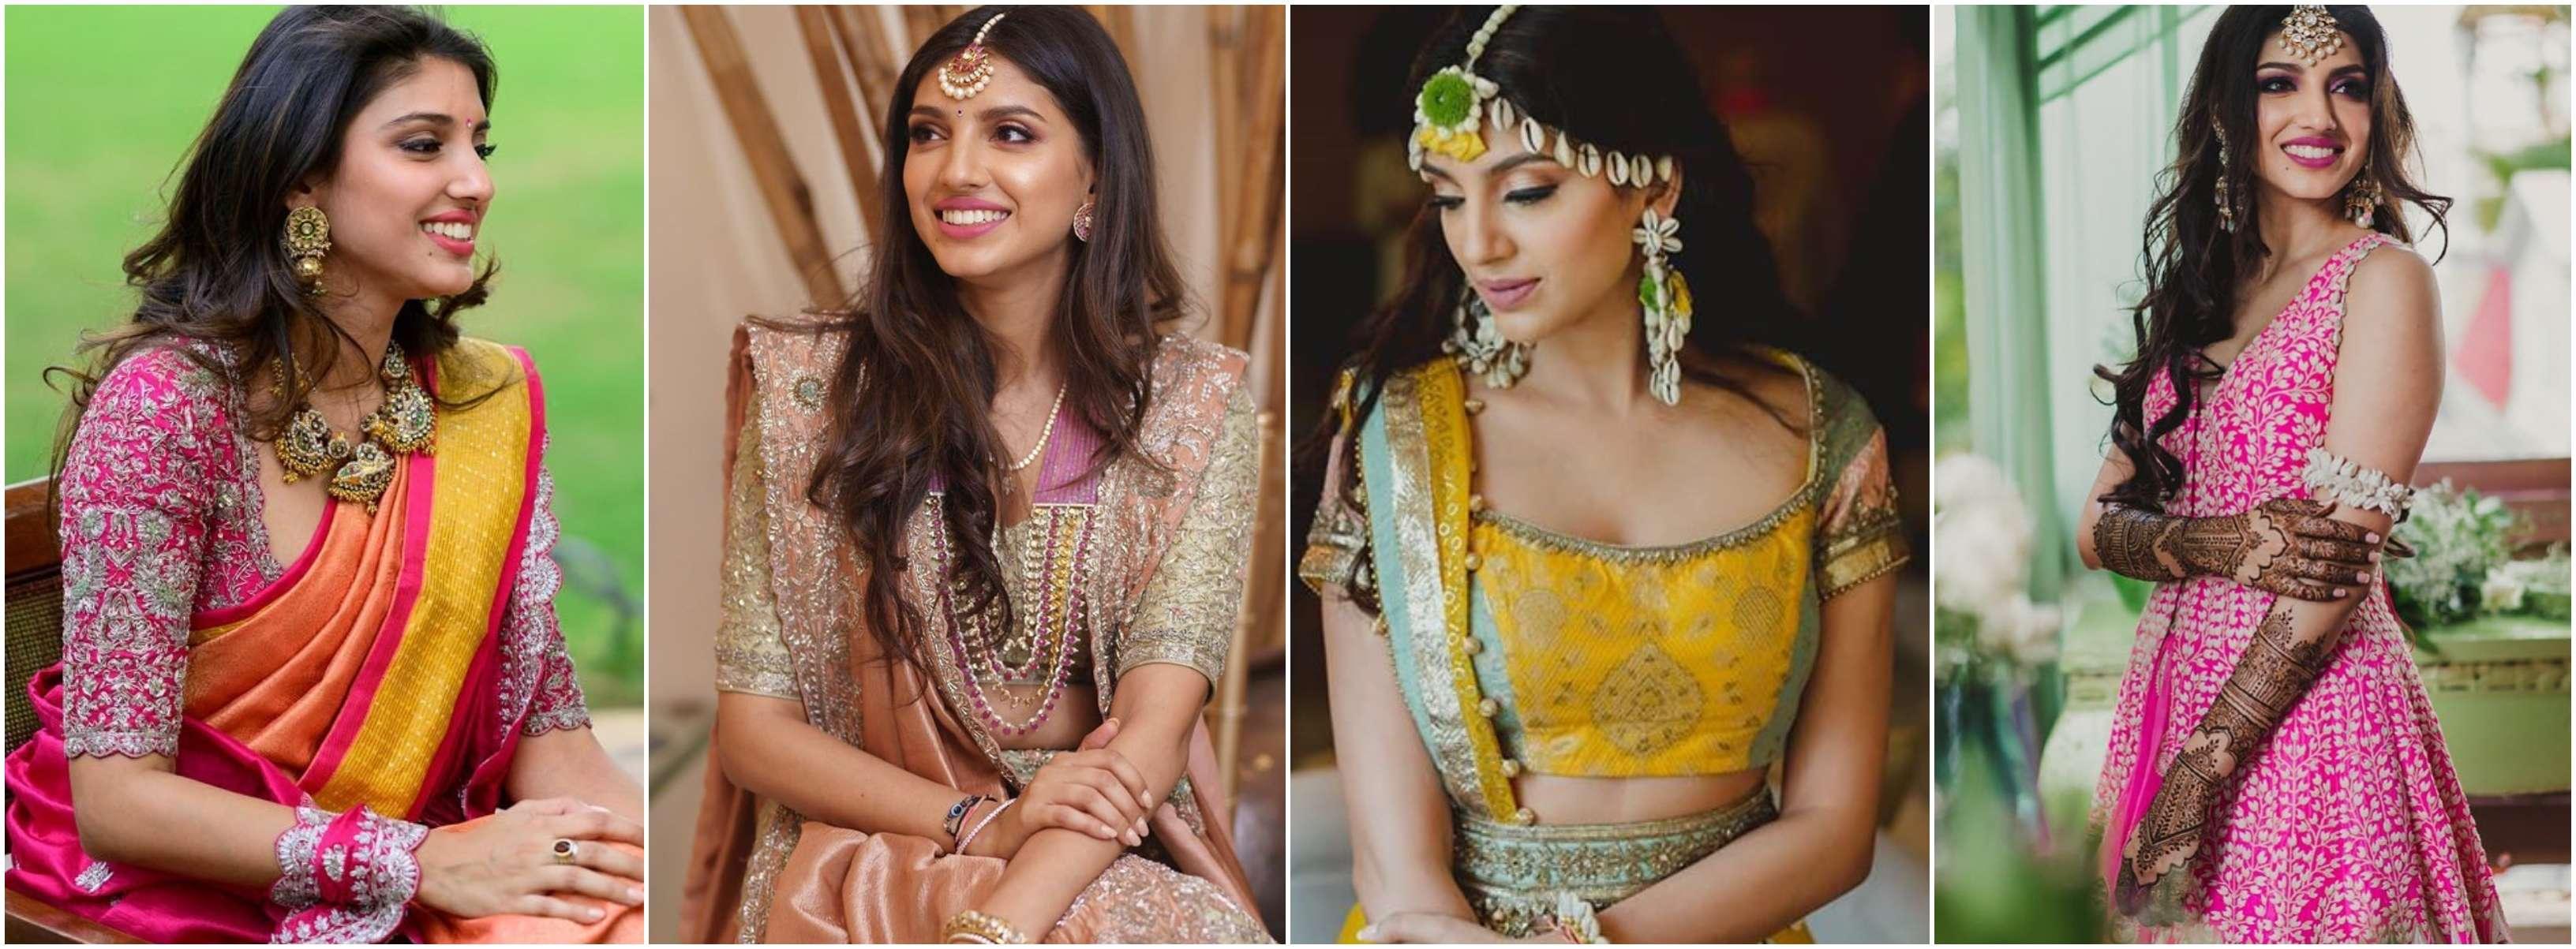 Miheeka Bajaj Four Wedding Looks